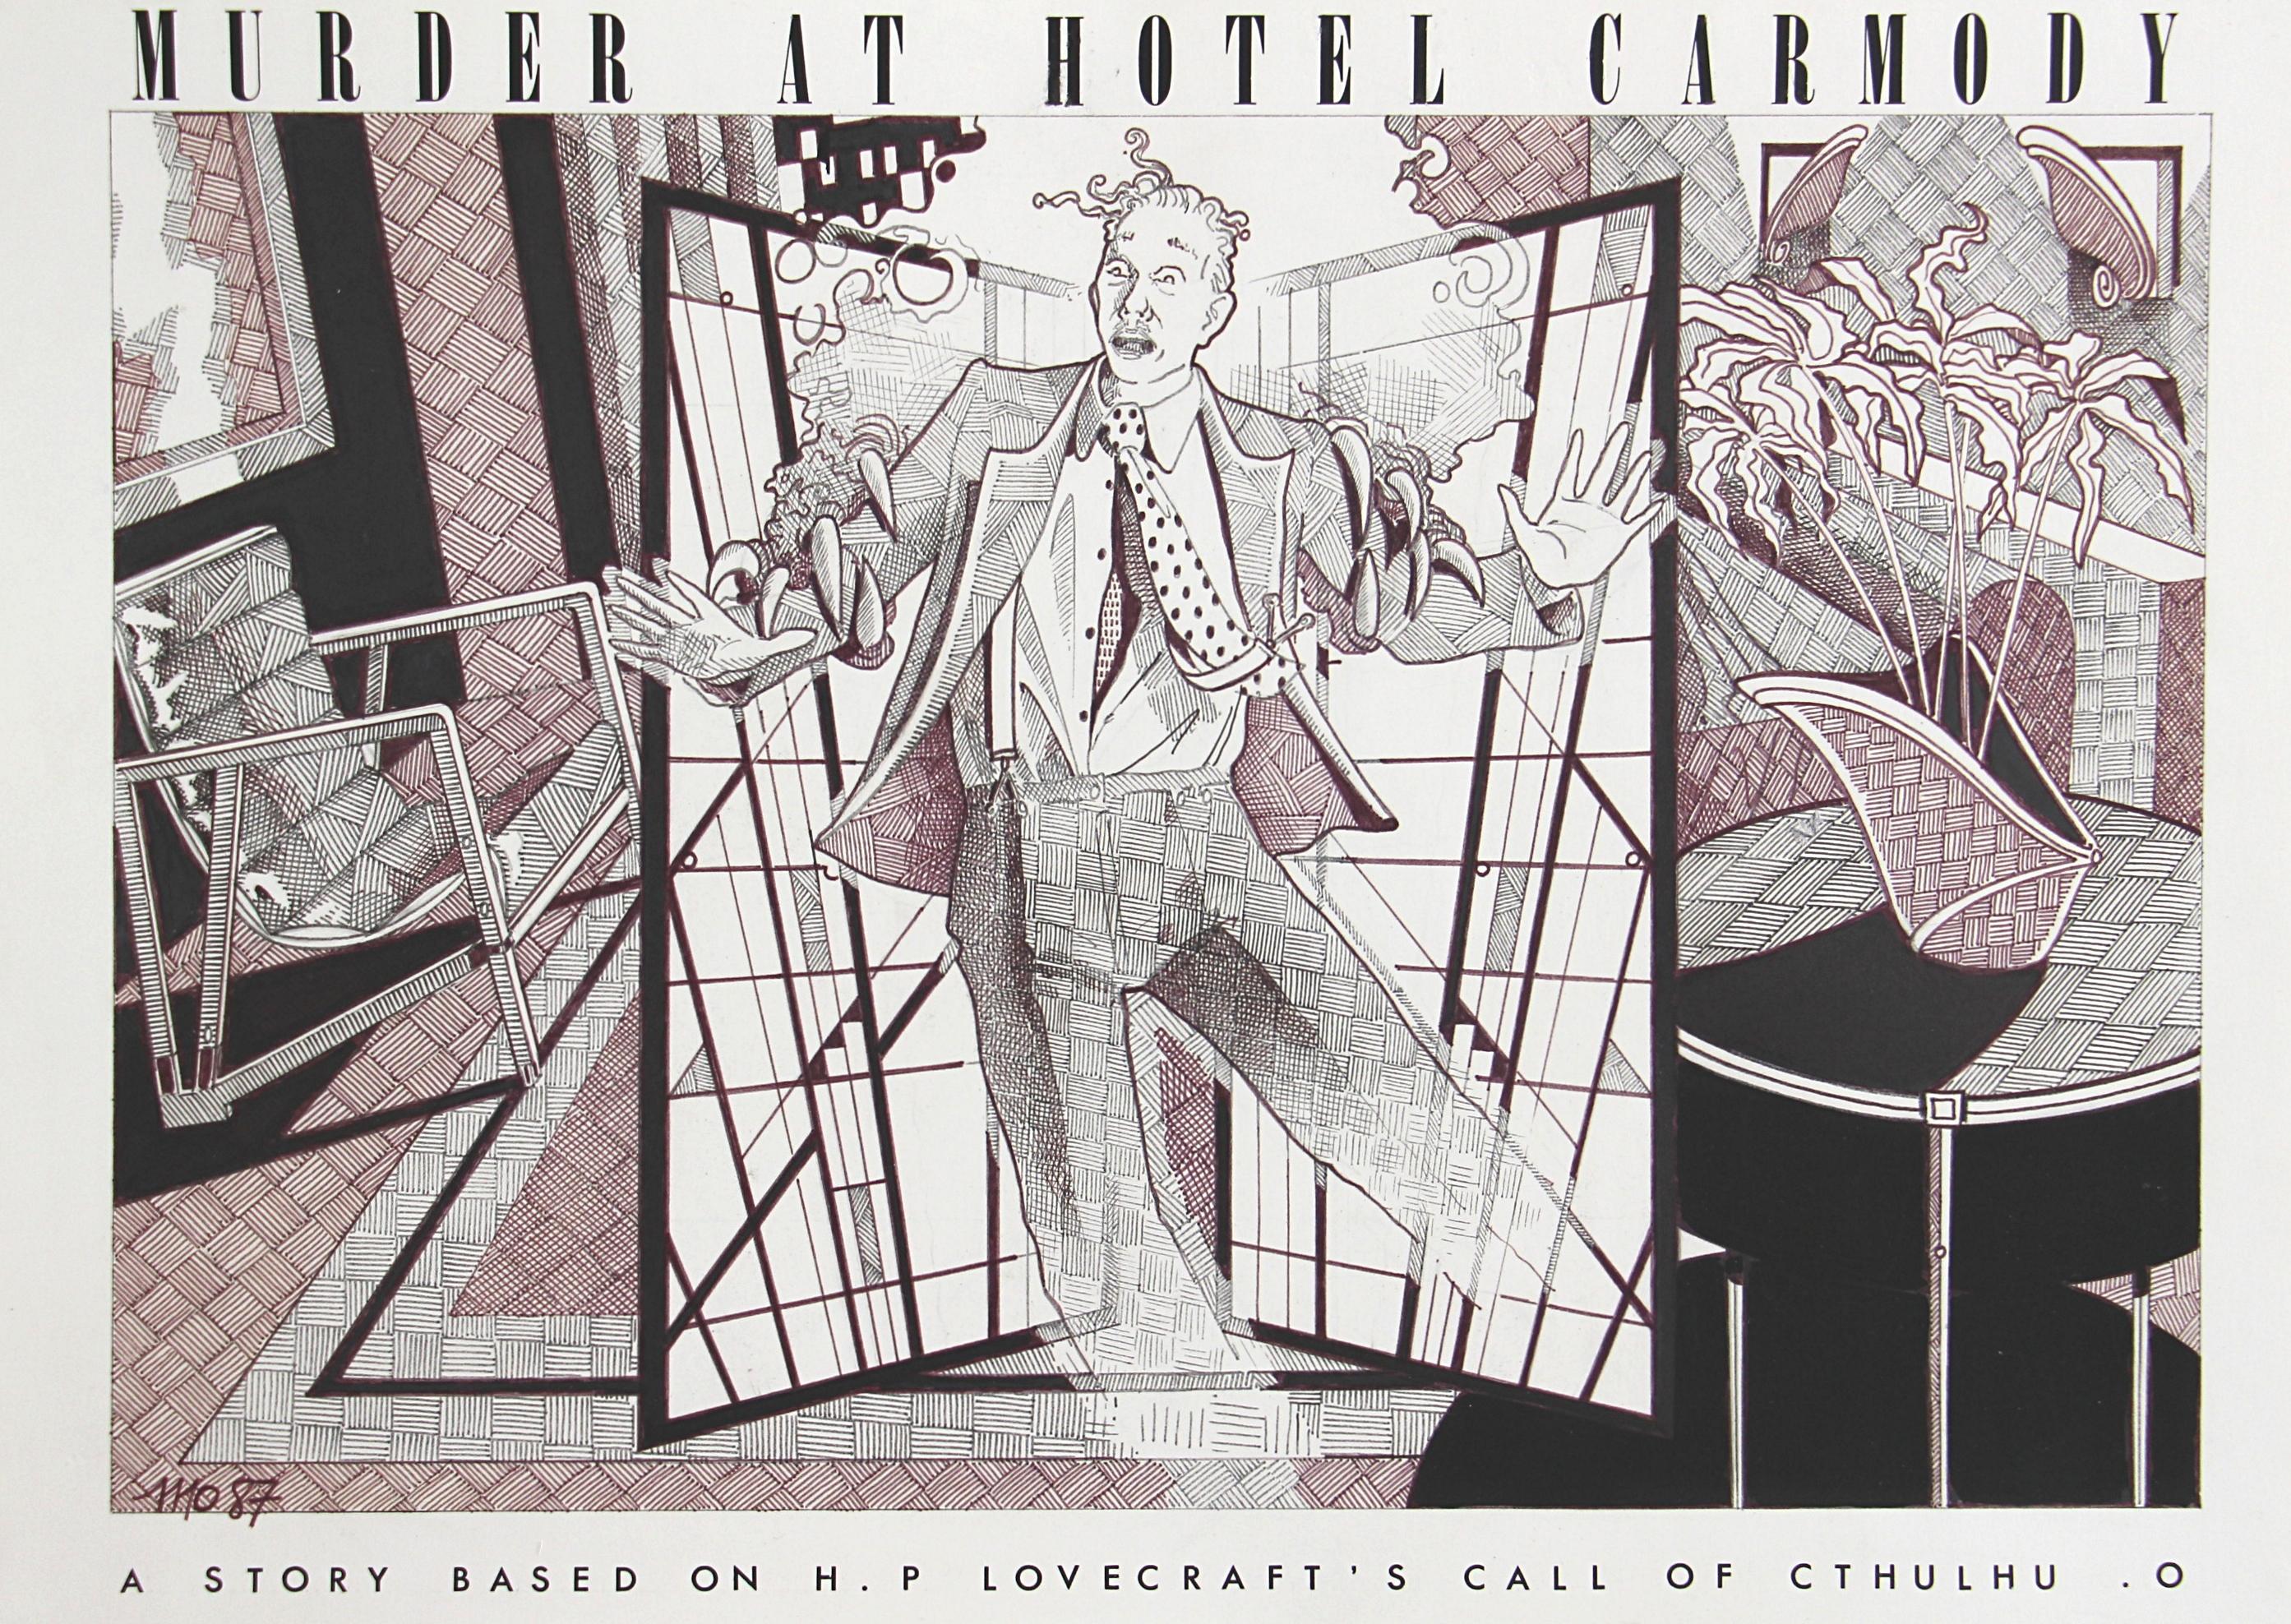 Murder at hotel Carmody